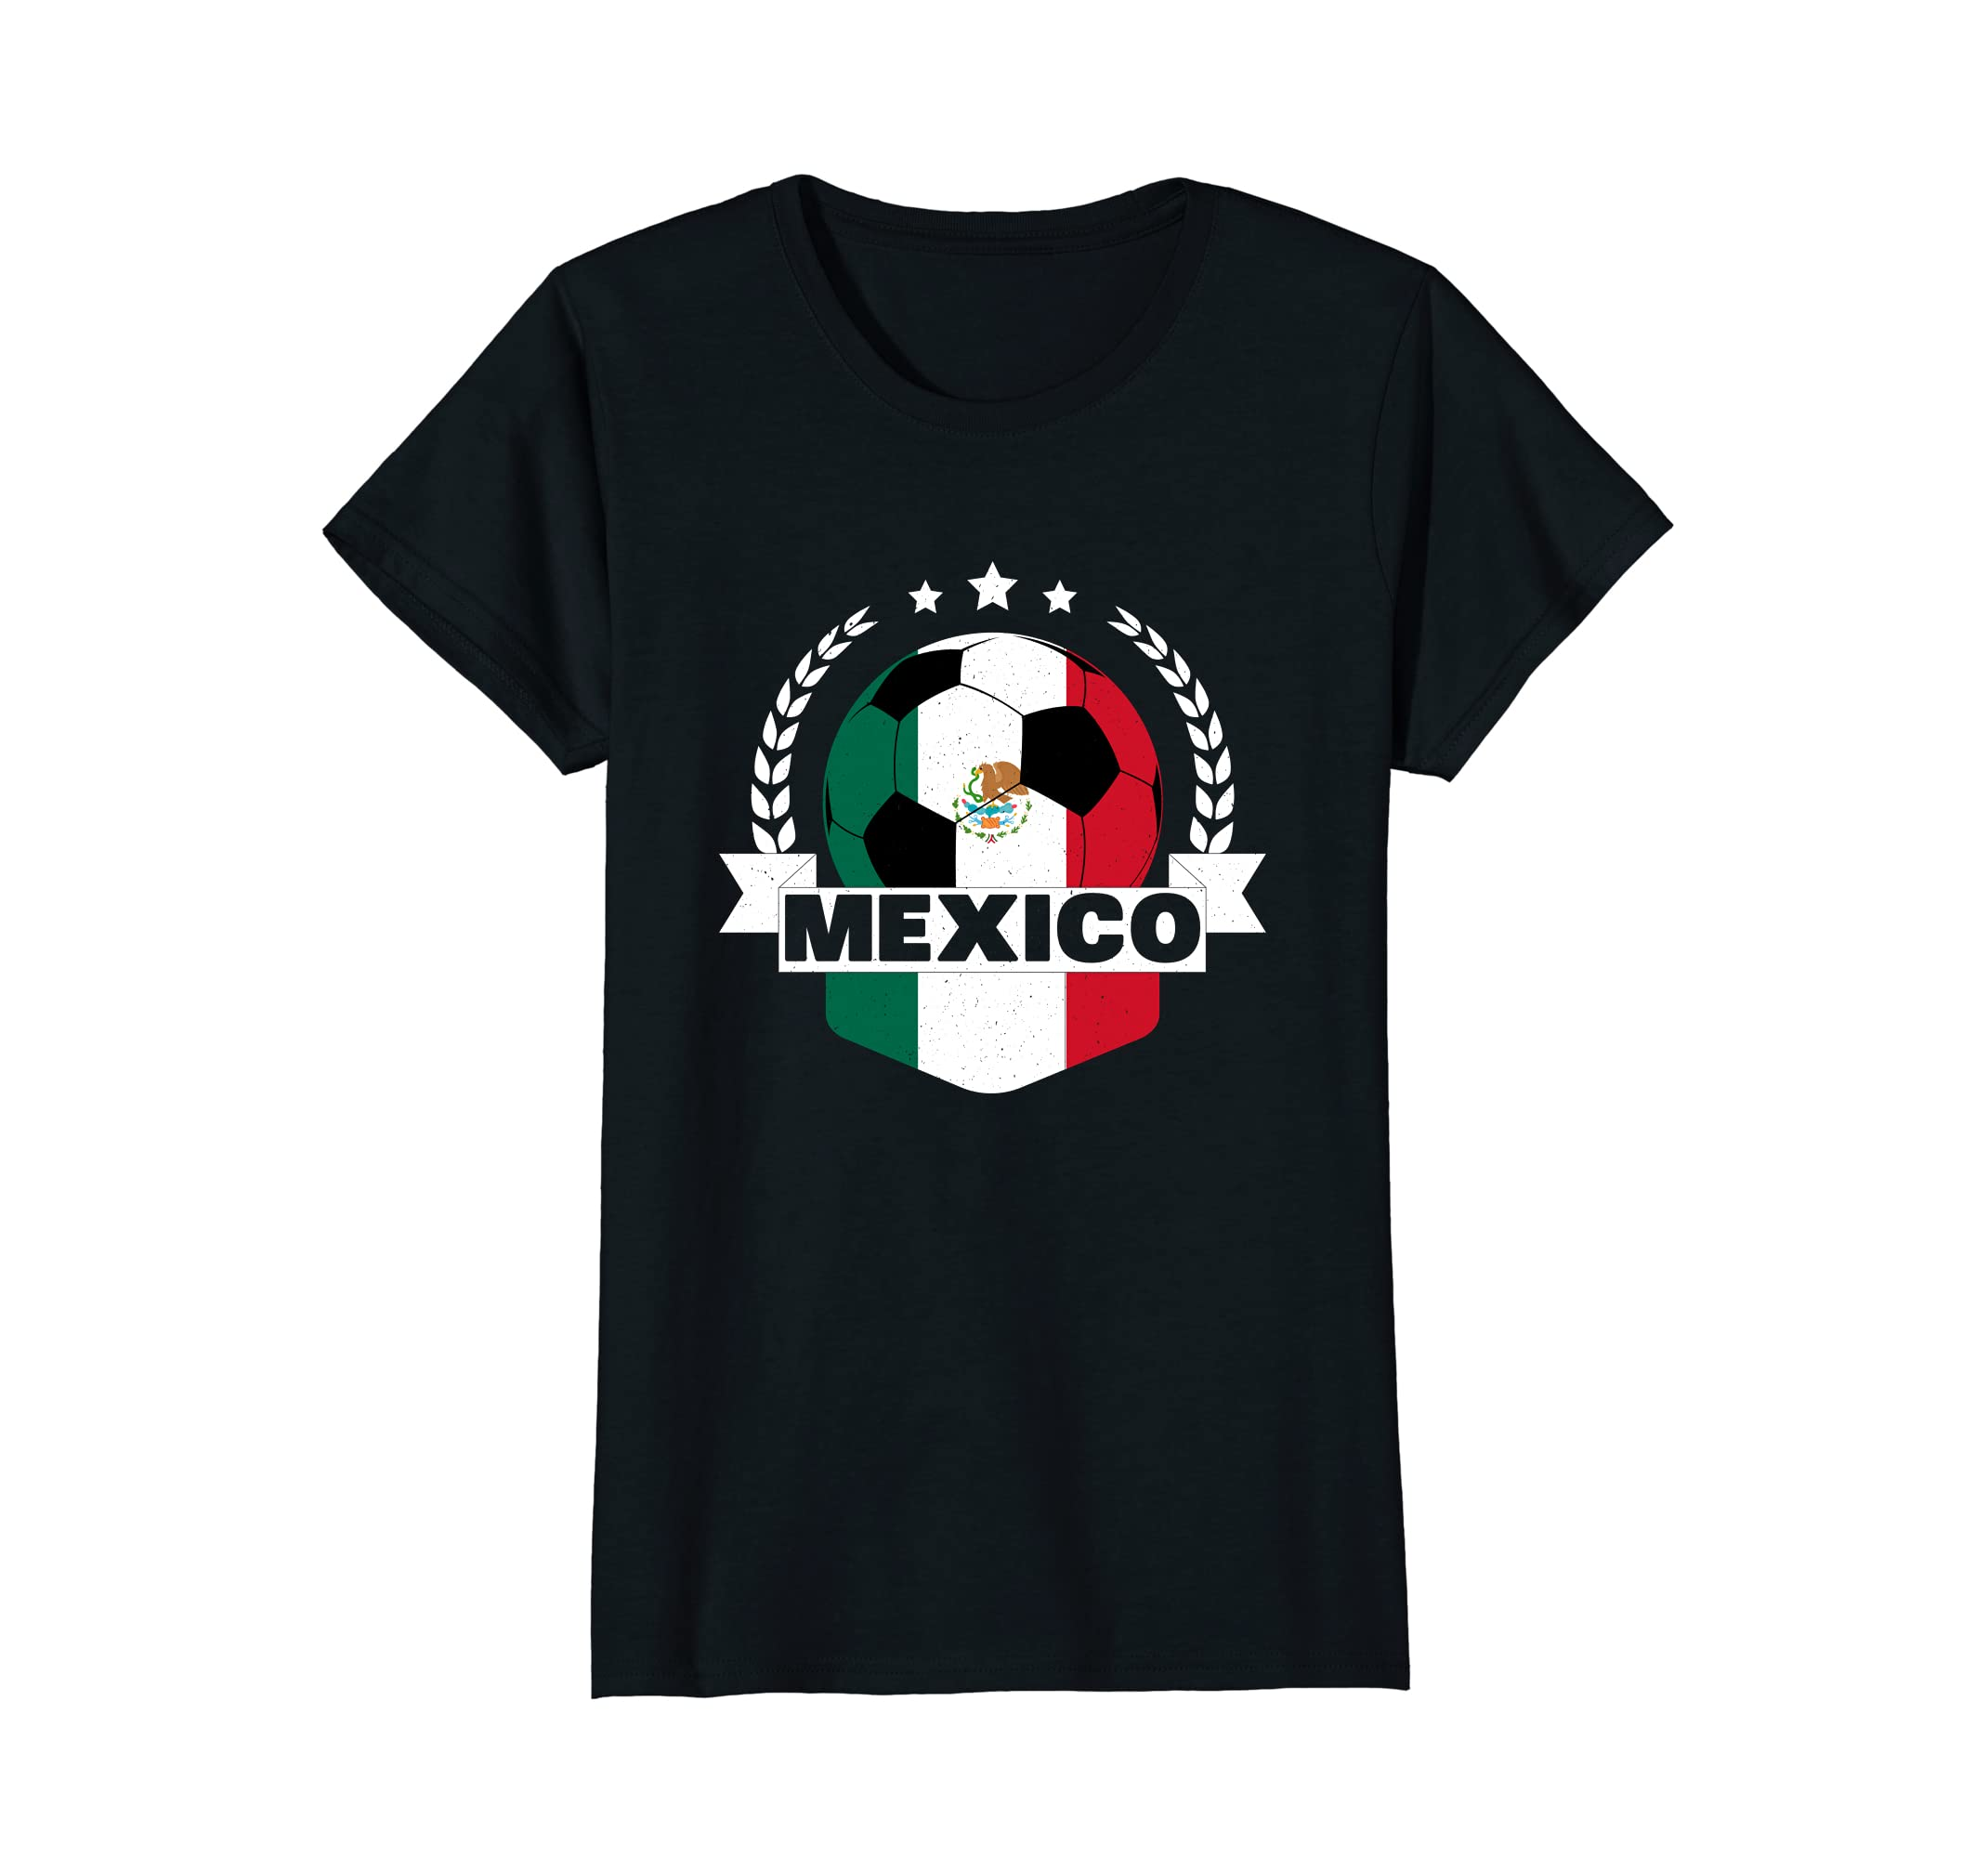 62c27dbf260 Amazon.com: Mexico Soccer Team 2018 Football Fan T-Shirt: Clothing